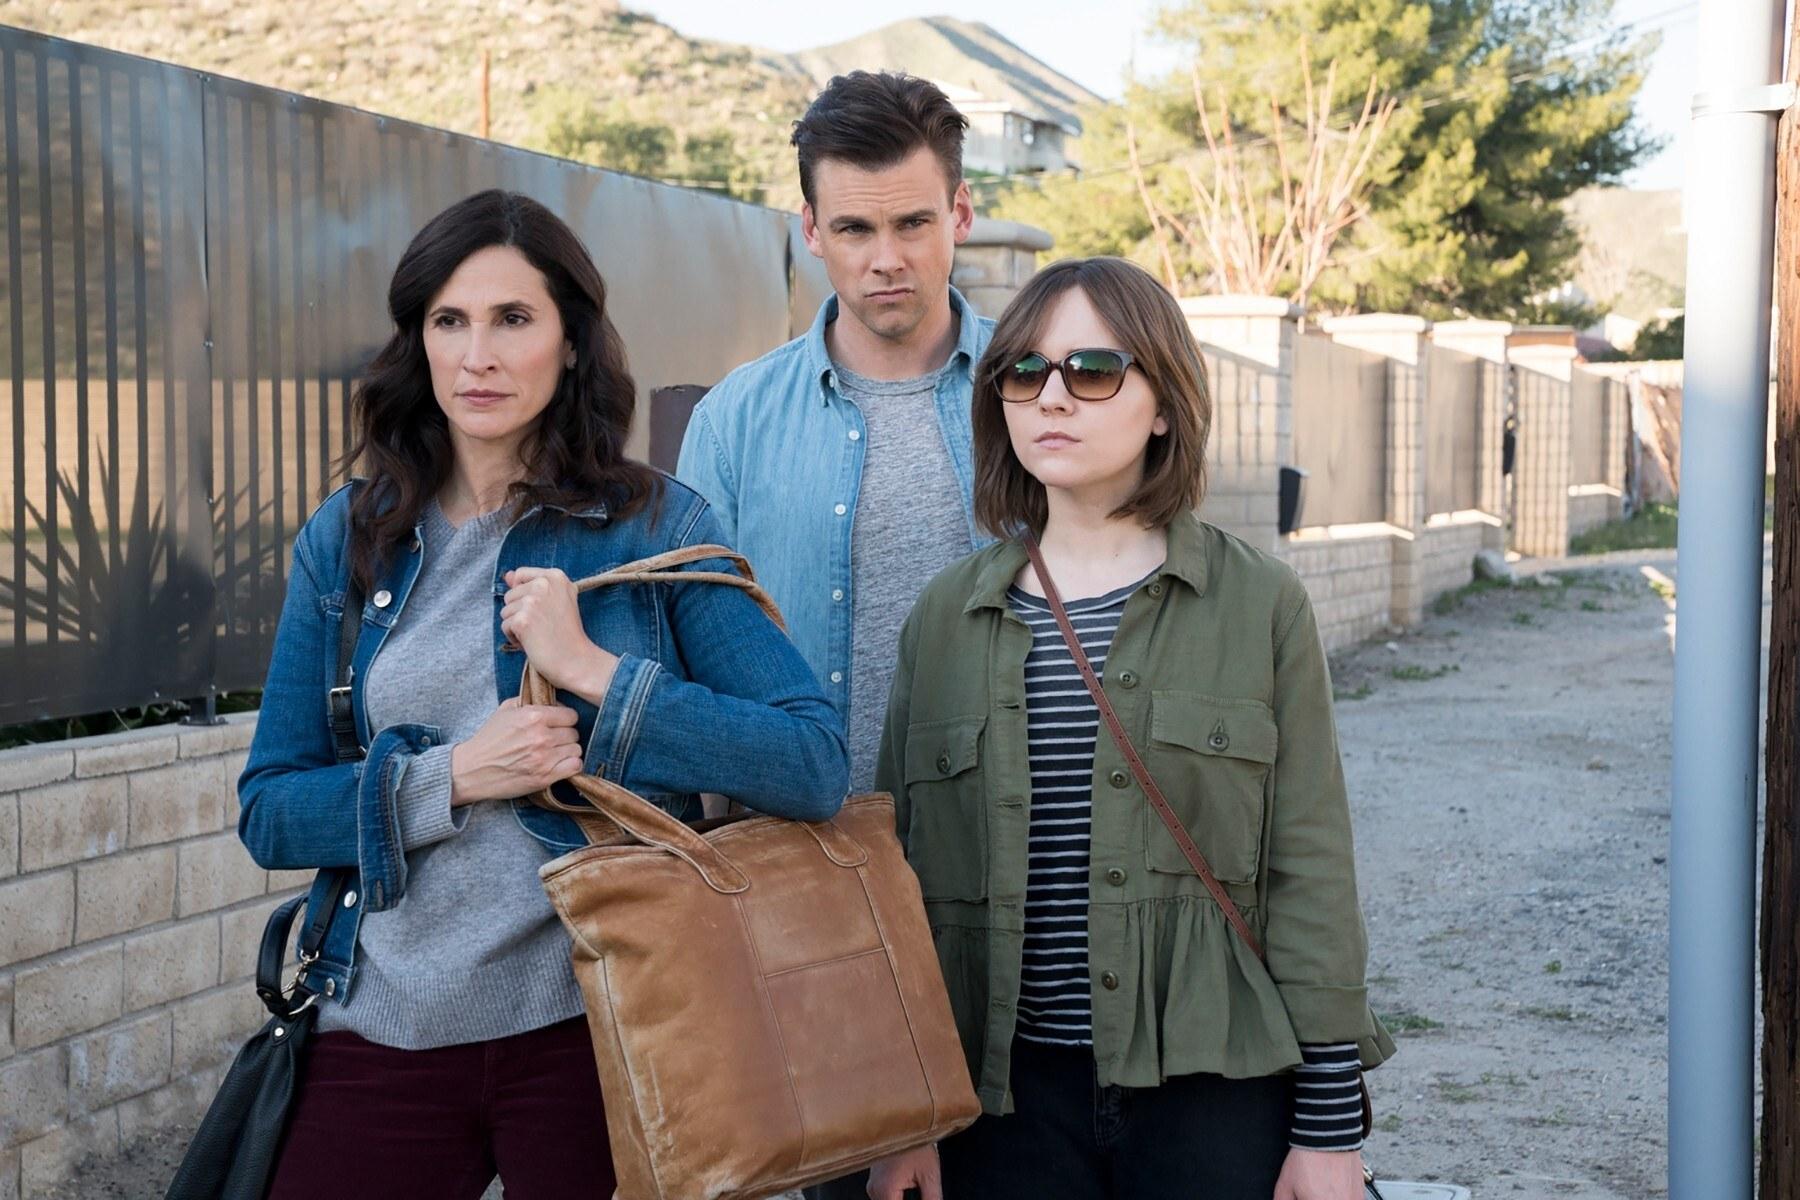 Michaela Watkins, Tommy Dewey, and Tara Lynne Barr in an alley